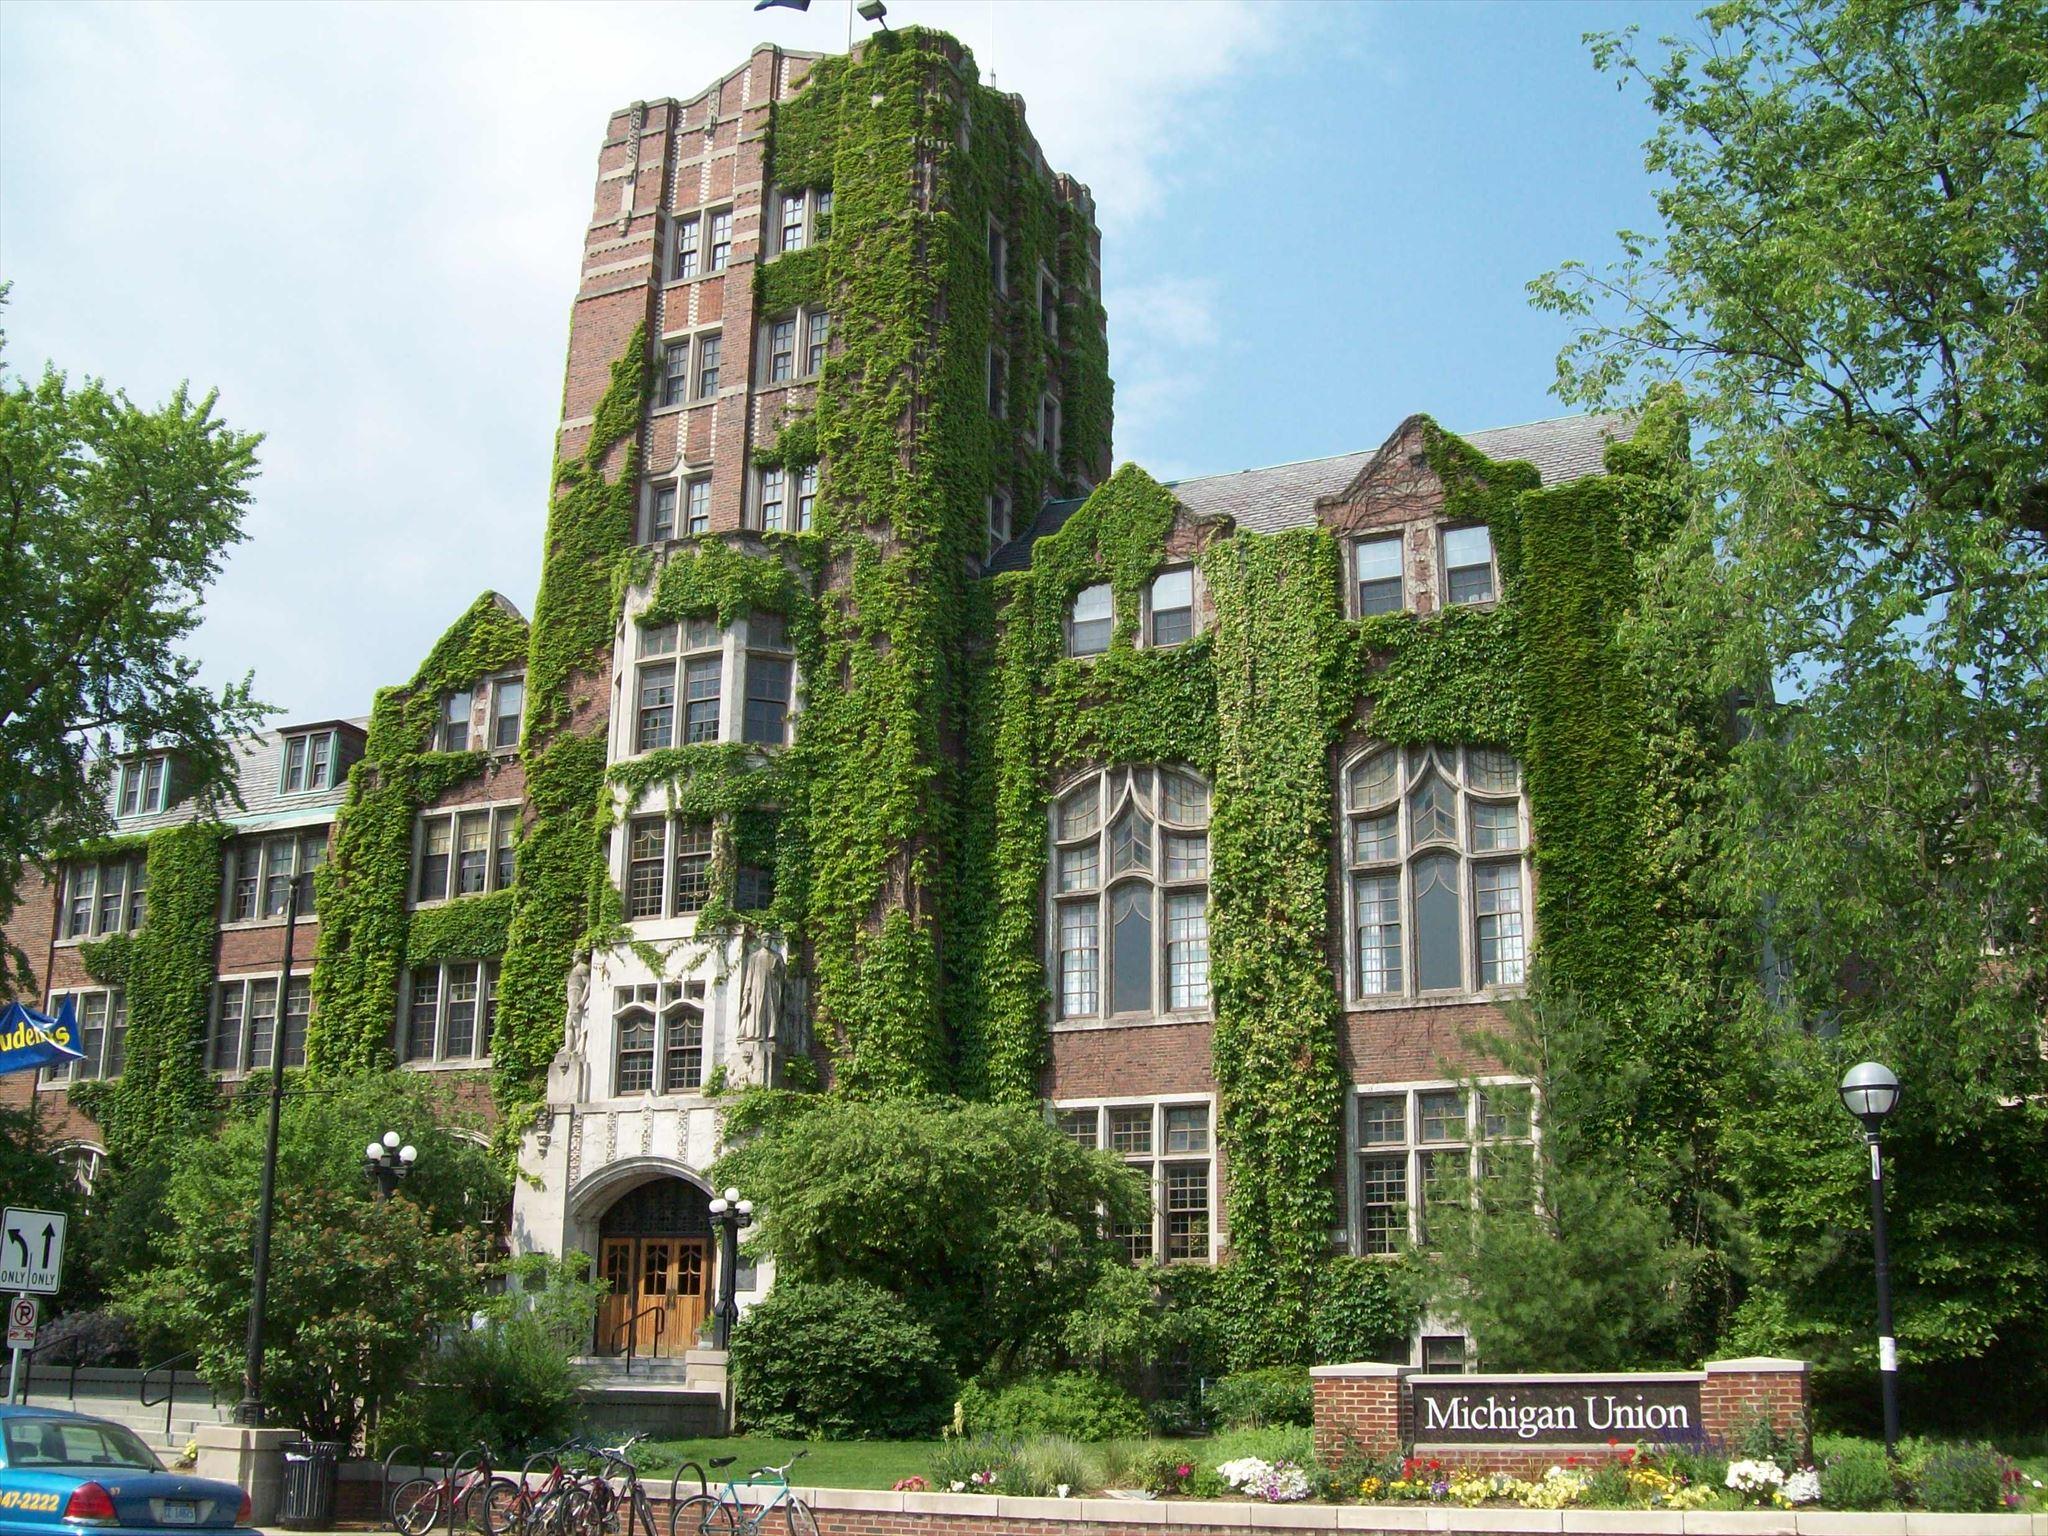 the michigan union university of michigan ann arbor michigan image